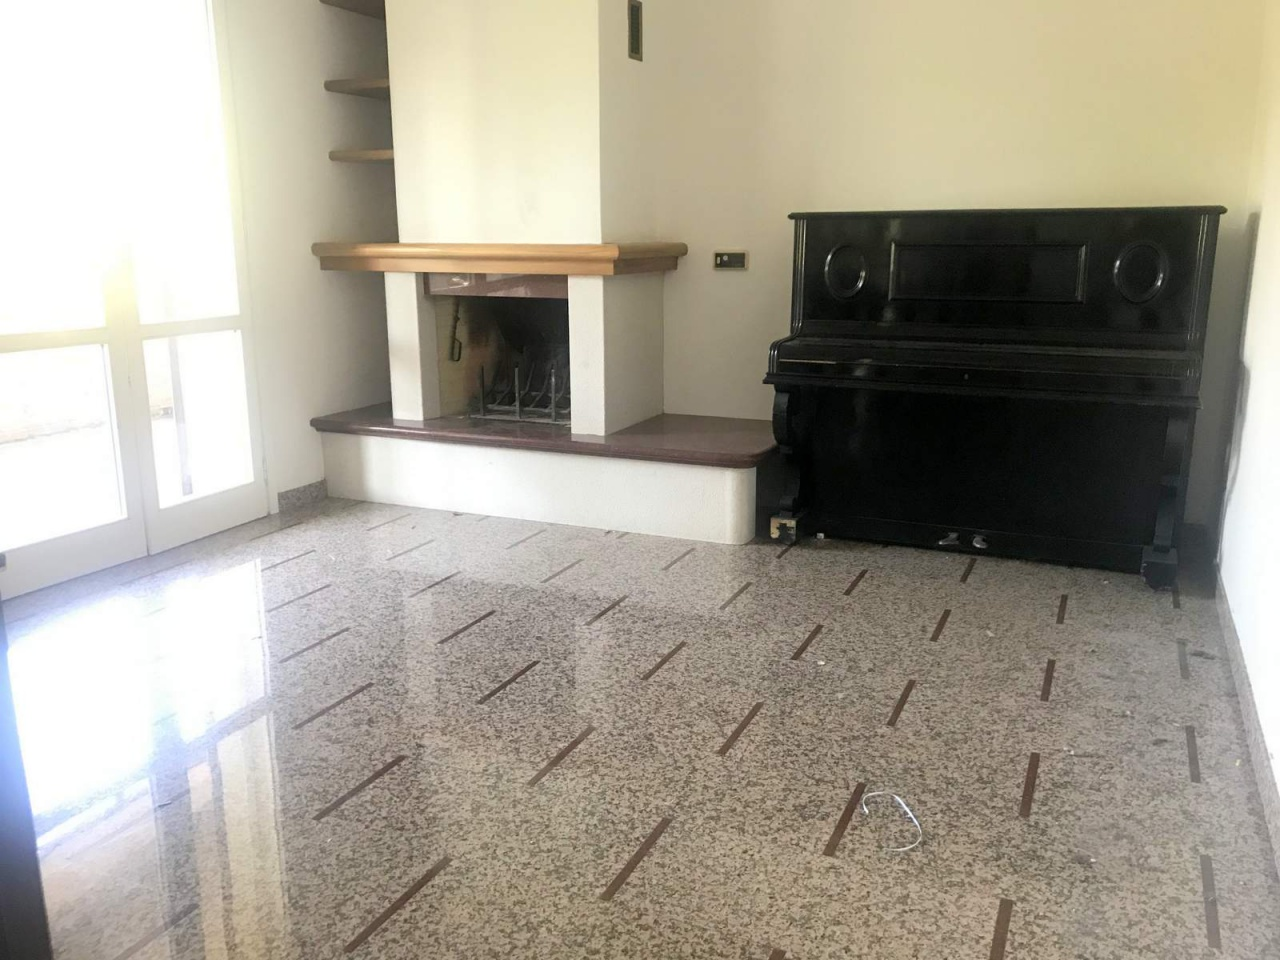 Appartamento, Via Cerchia 109bis, Affitto - Forlì (Forlì - Cesena)